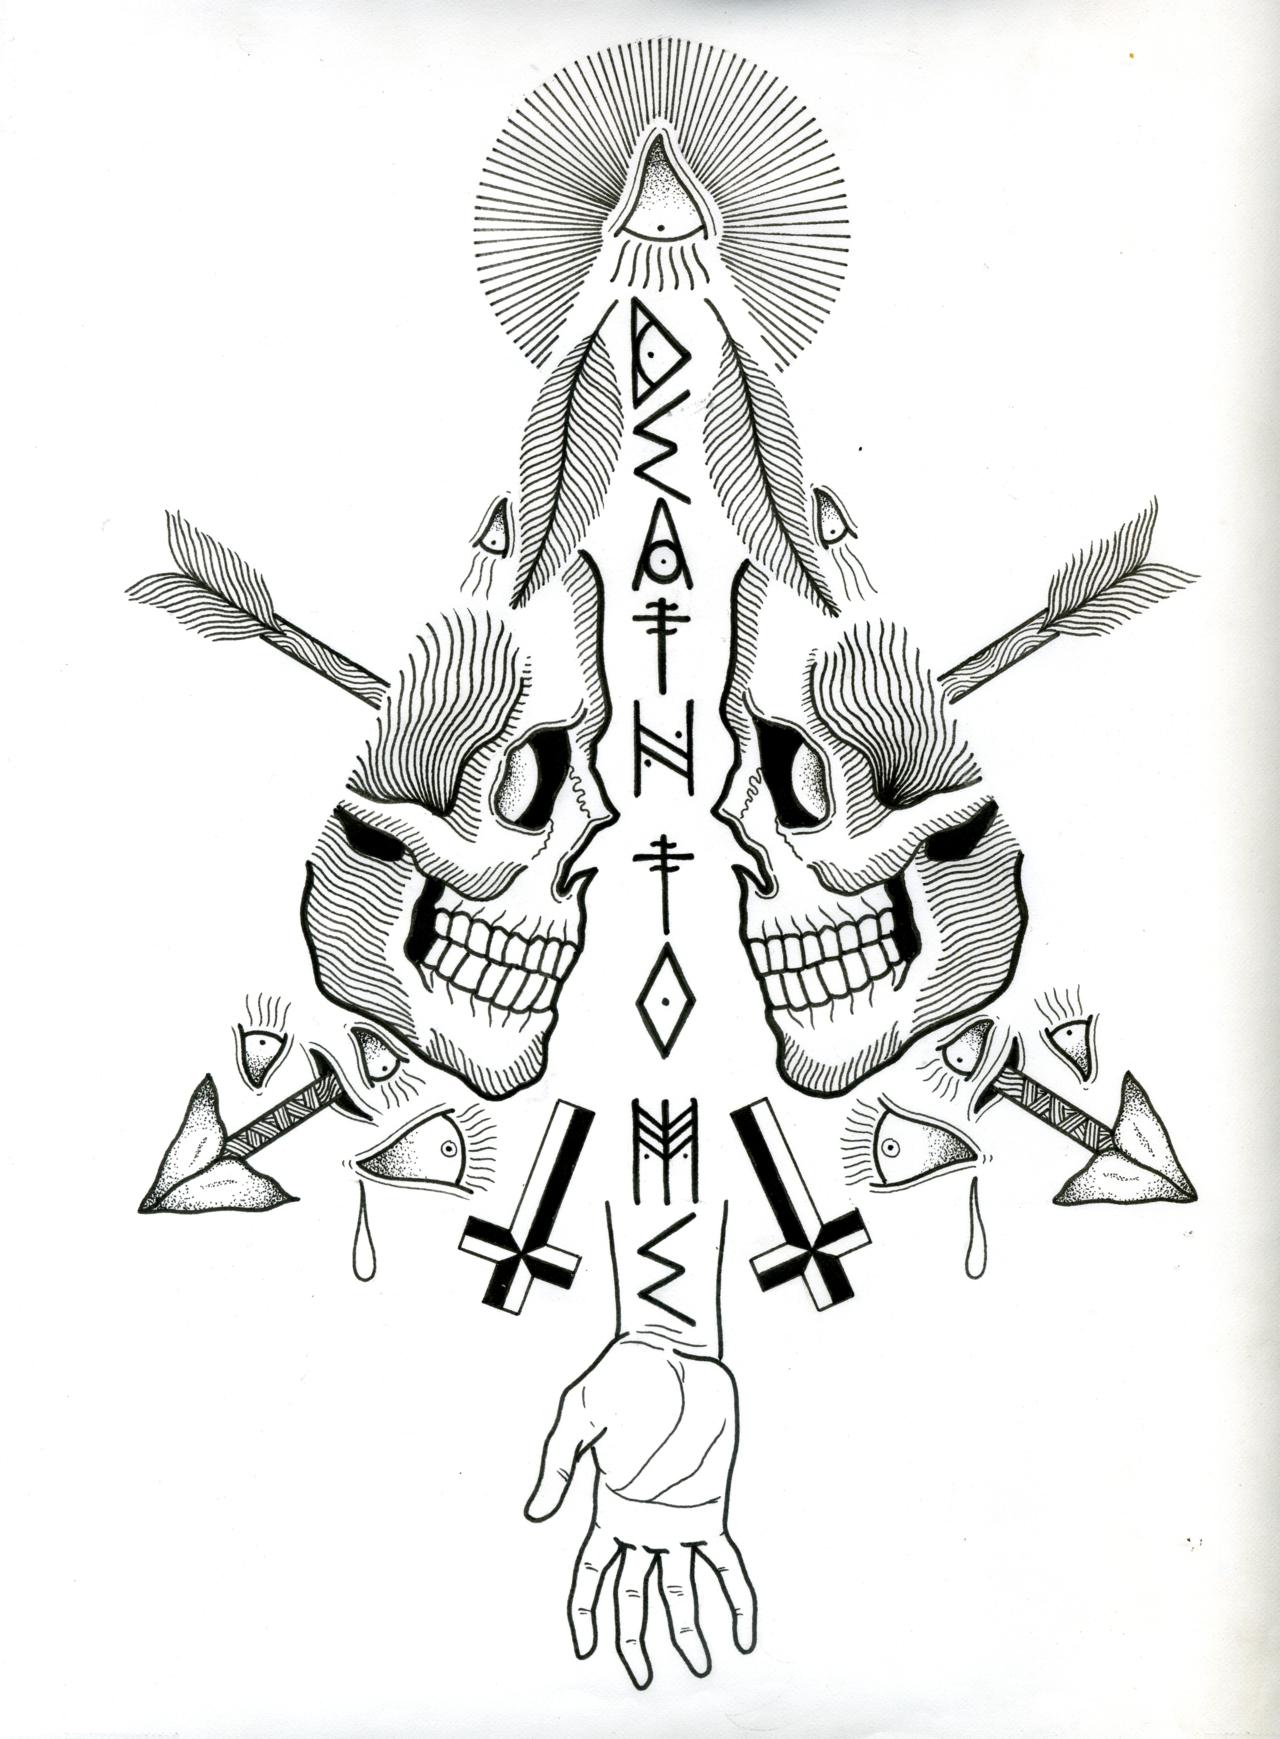 andreirobu: Designersgotoheaven.com - Death to mebyDavid M Cook.